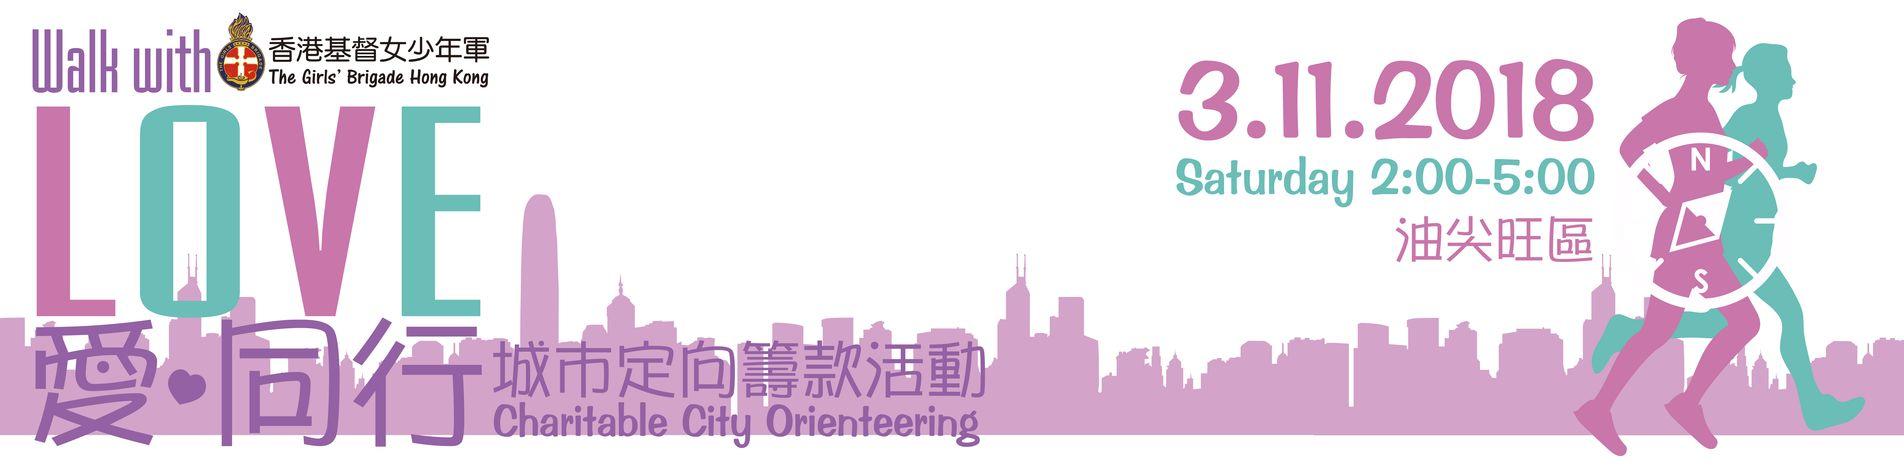 """Walk with LOVE"" Charitable City Orienteering"